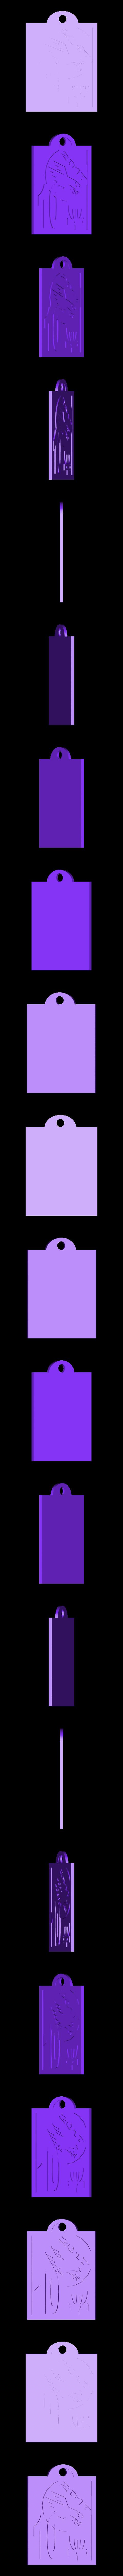 Disc_Bag_Tag_10.stl Download free STL file Disc Golf Bag Tag • 3D print design, mrhers2